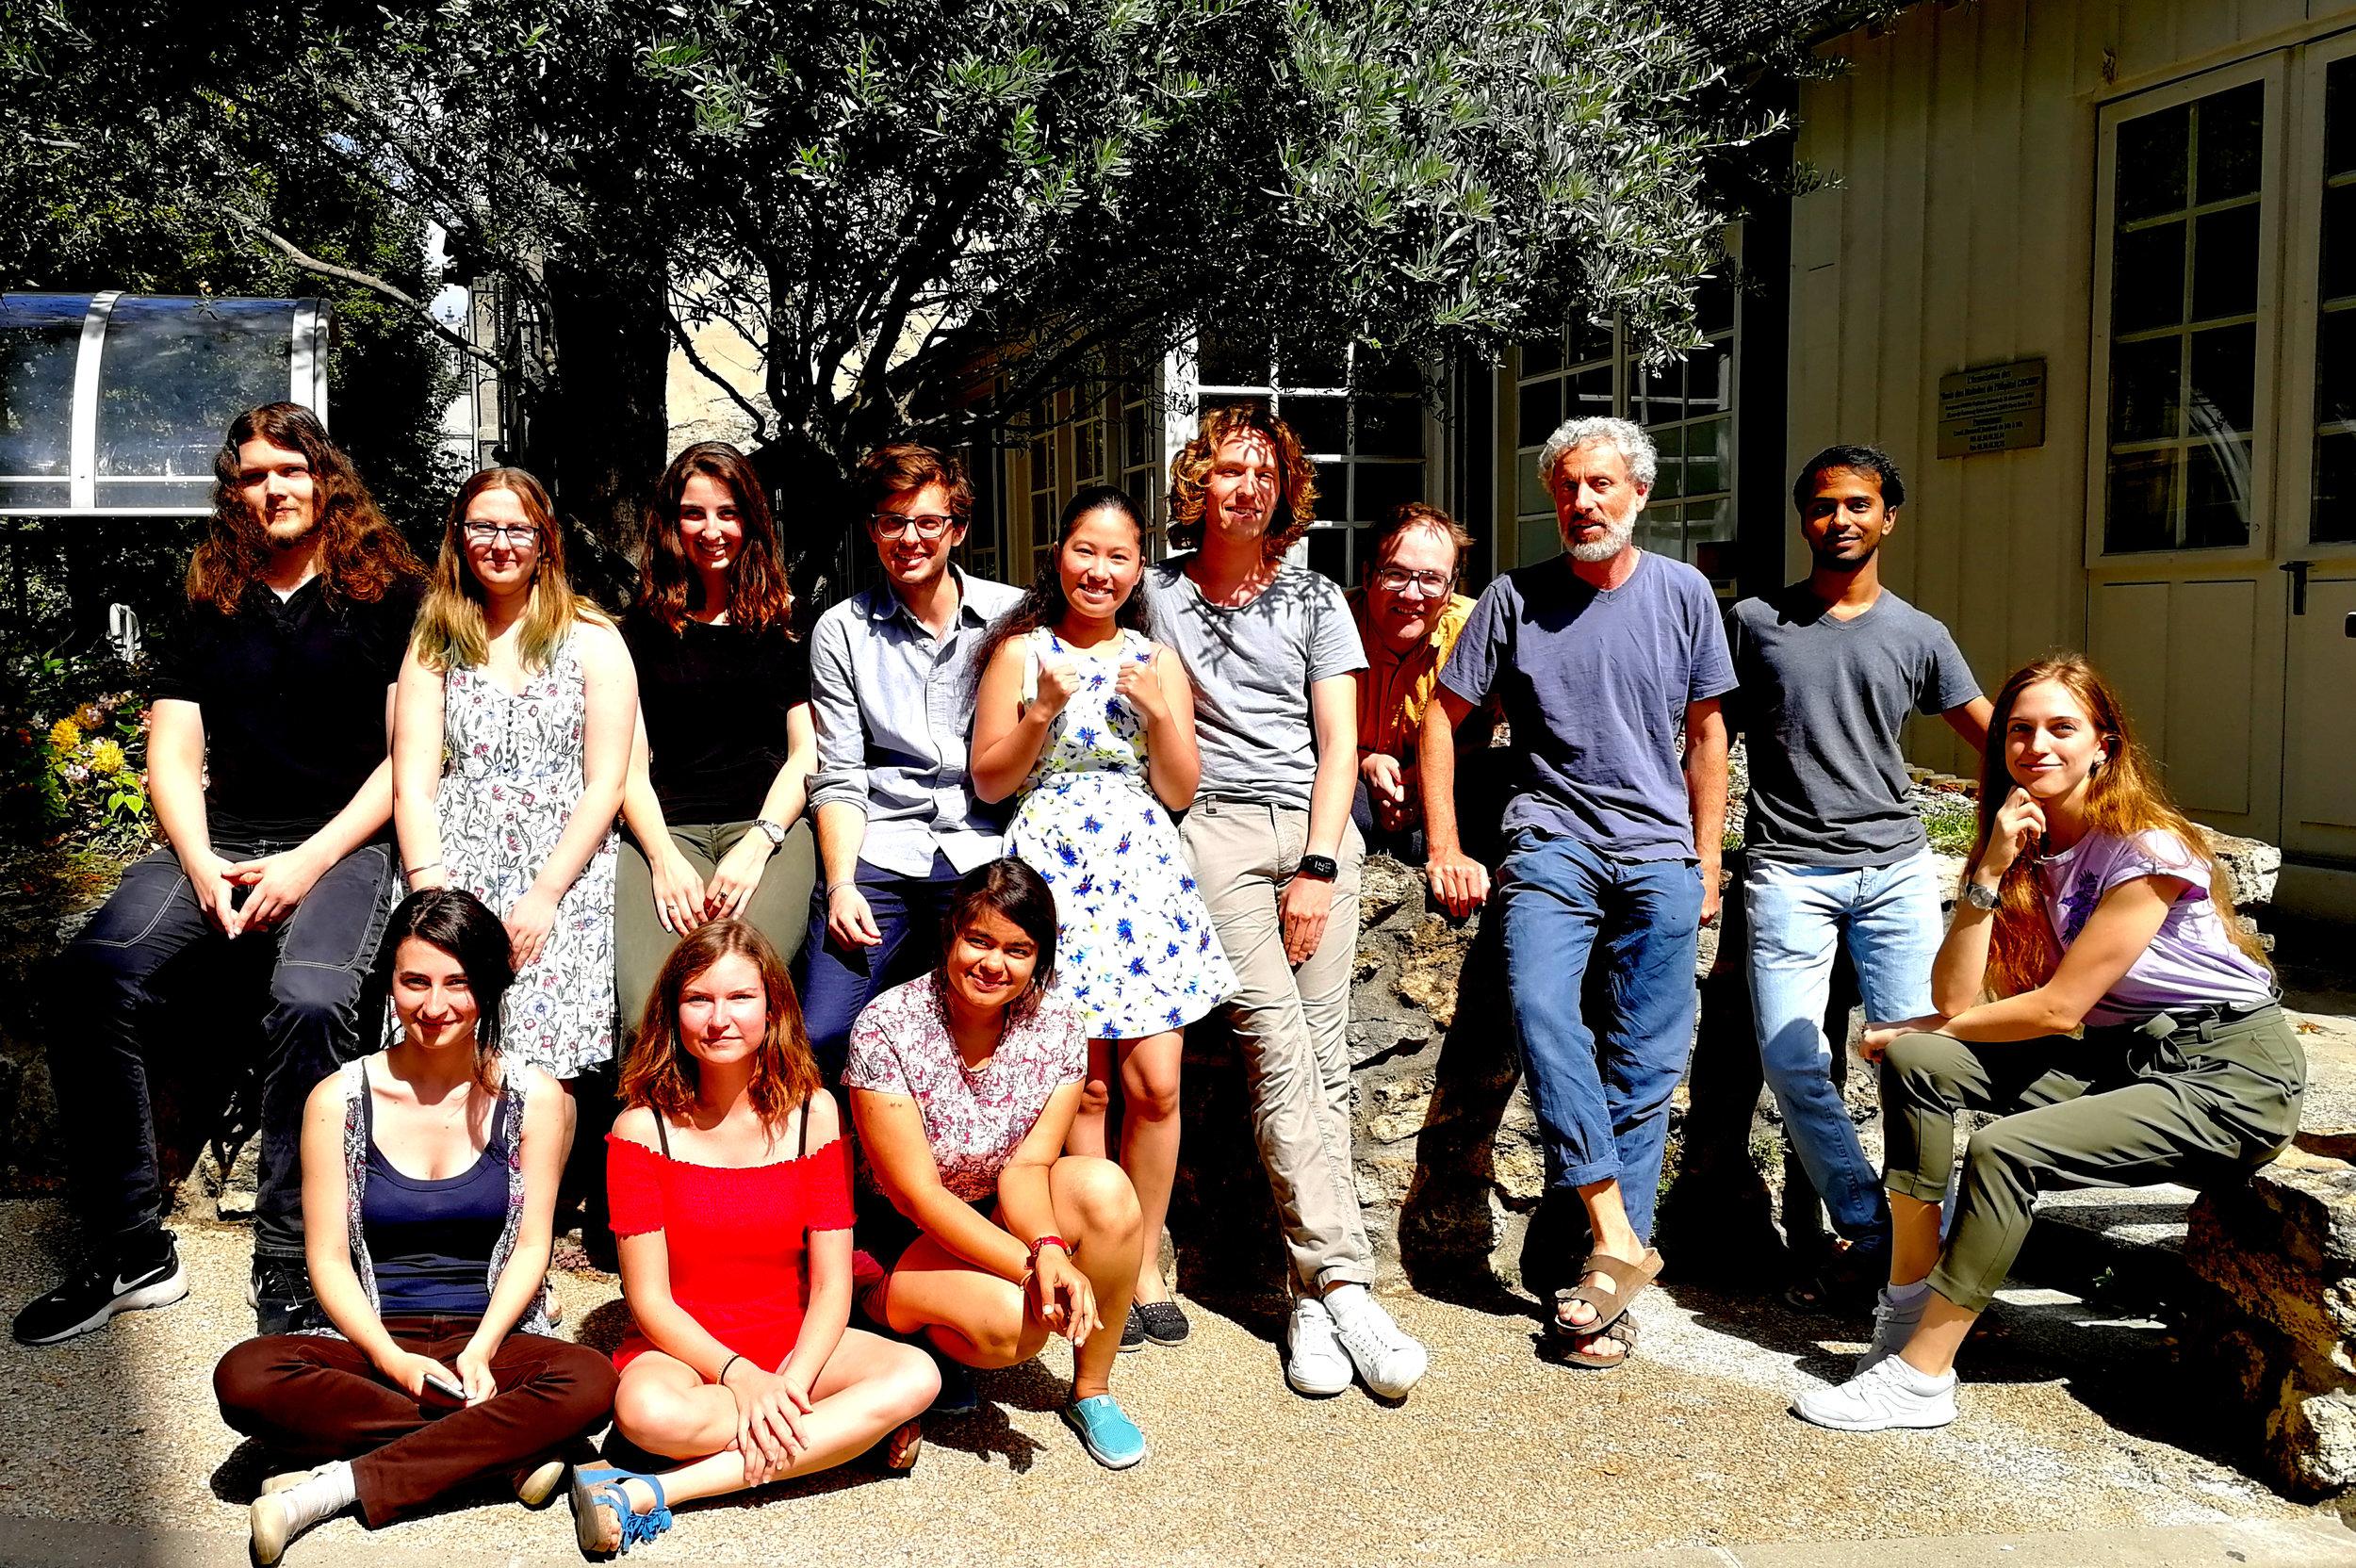 iGEM Paris Bettencourt Team (2018) group photo. Left to right: Maksim Baković, Juliette Delahaye, Annissa Améziane, Santino Nanini, Elisa Sia (Team leader), Antoine Levrier, Jake Wintermute (Secondary P.I.), Ariel Lindner (Primary P.I.), Darshak Bhatt (Team leader), Oleksandra Sorokina (Advisor). Bottom row: Anastasia Croitoru, Camille Lambert, Naina Goel. Missing from the photo are Shubham Sahu, Alexis Casas, Haotian Guo (Mentor), Ana Santos (Mentor), and Gayetri Ramachandran (Mentor)